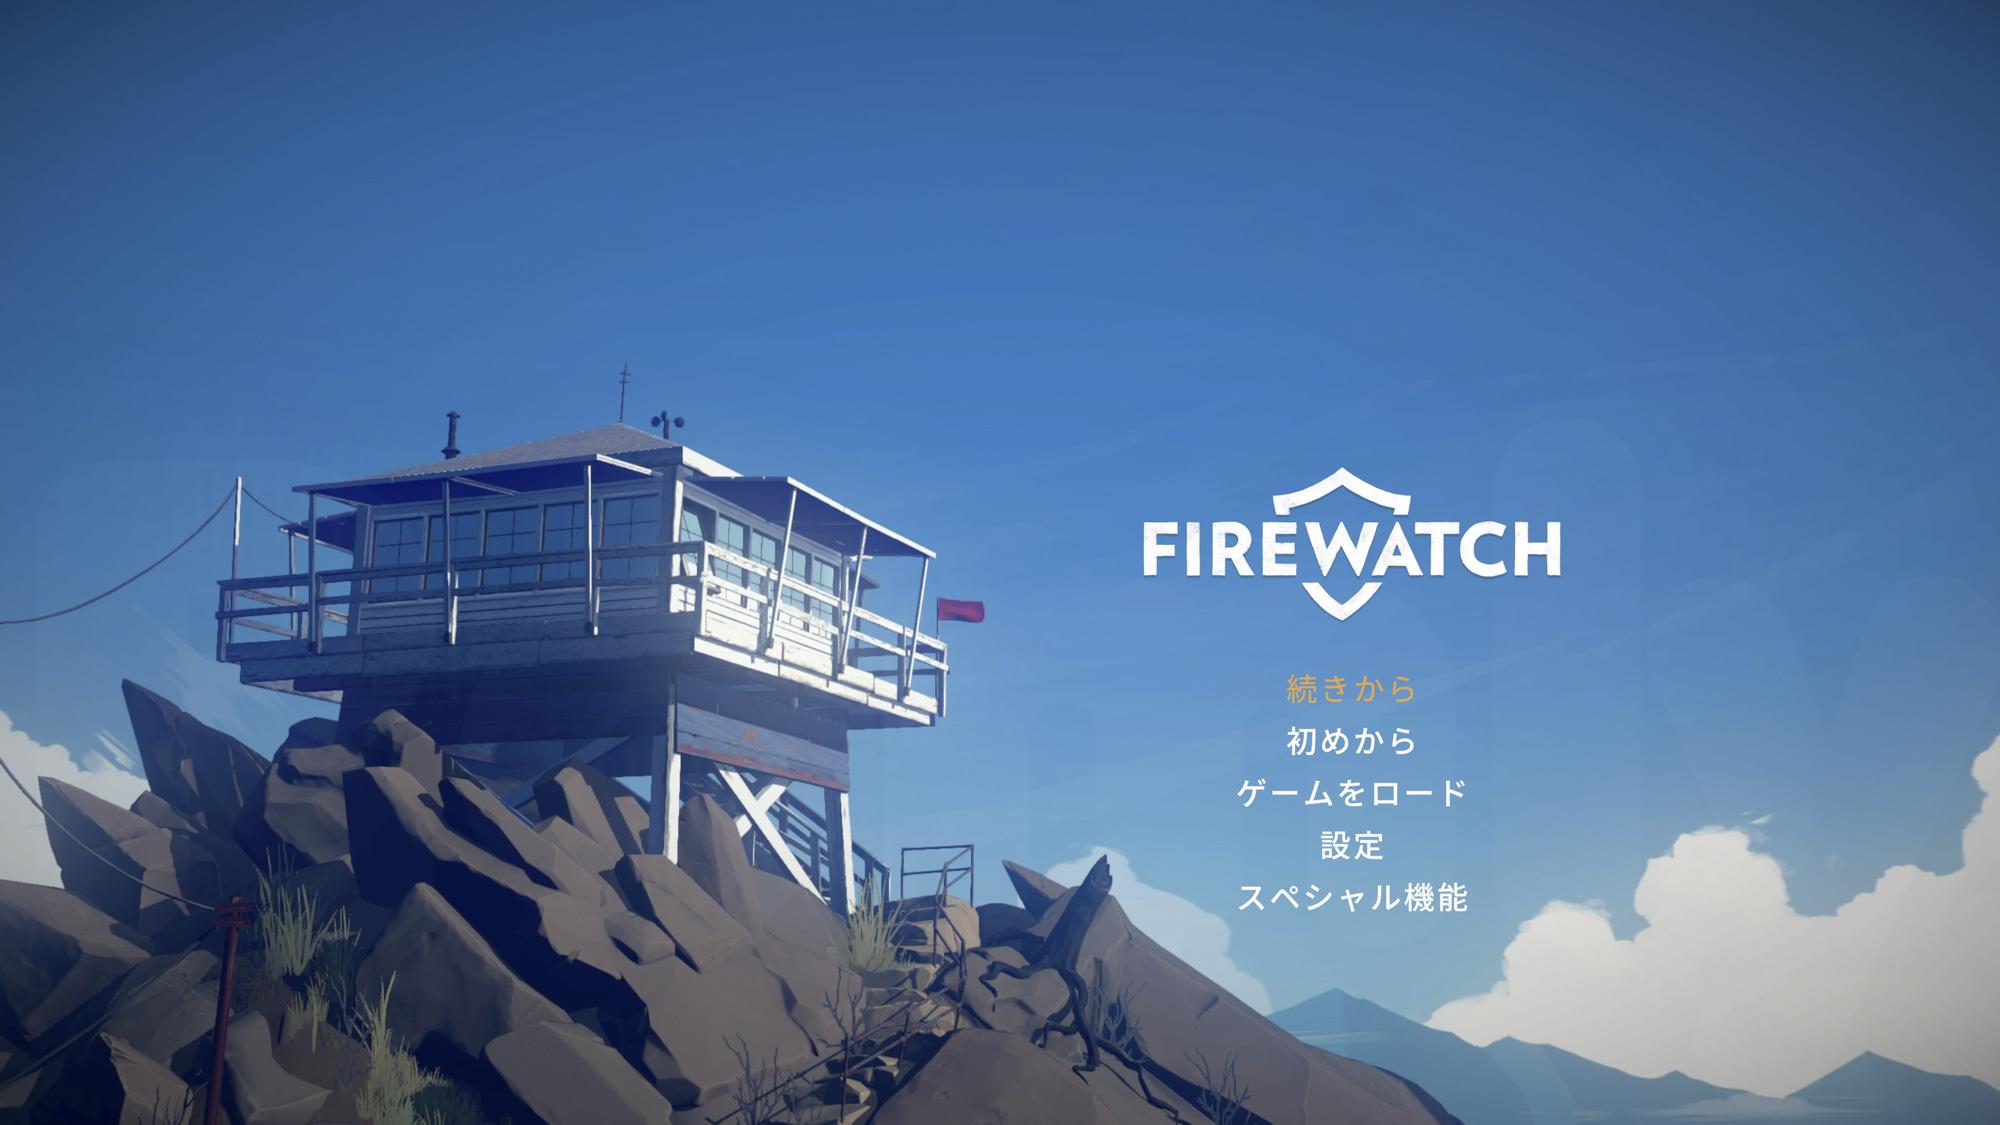 FIREWATCH タイトル画面